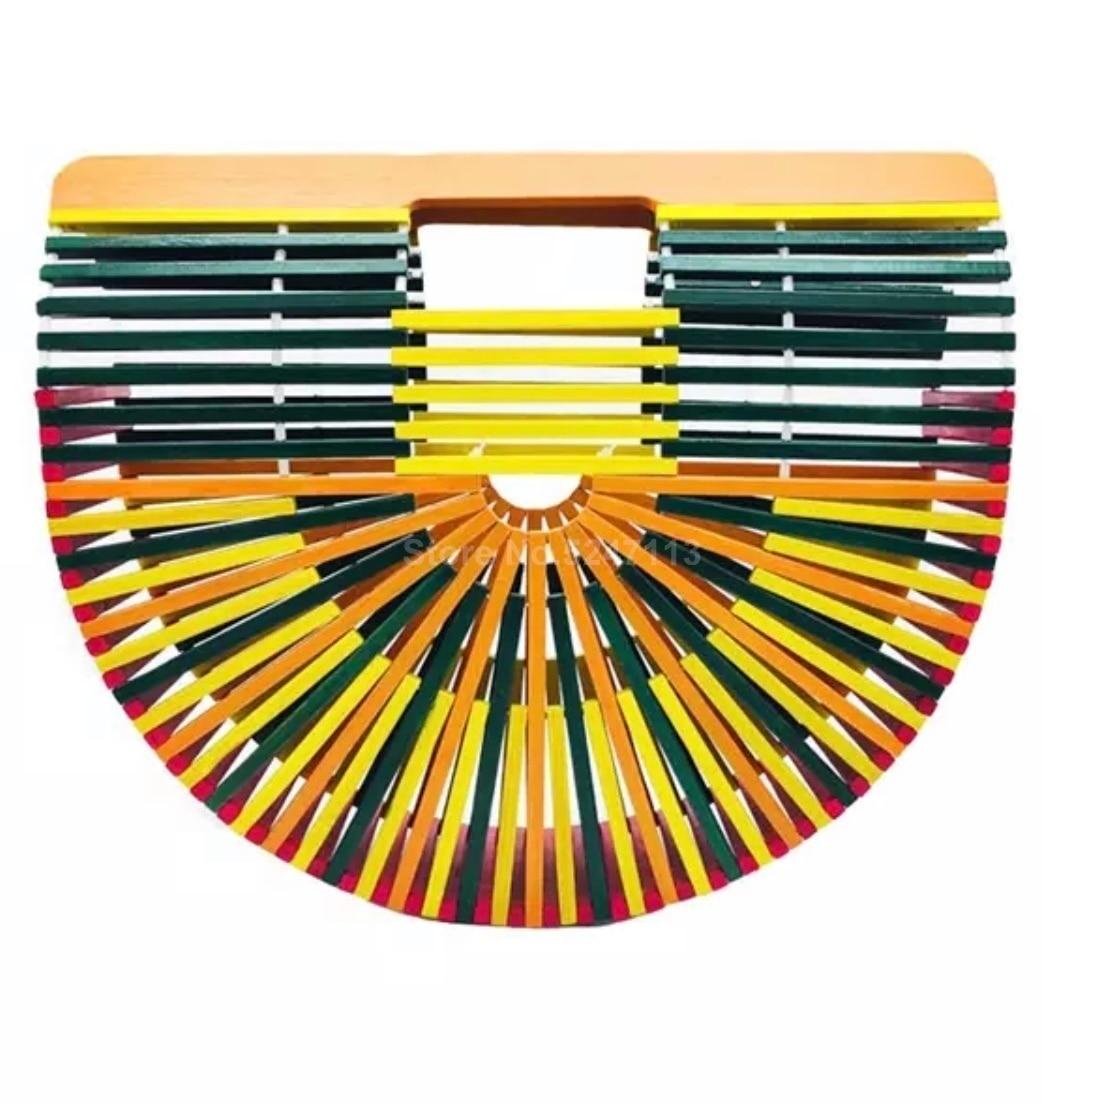 New High-grade Color Bamboo Bag Personality Beach Bag Portable Green Handmade Bag Rattan Handbag Outdoor Clutch Bag